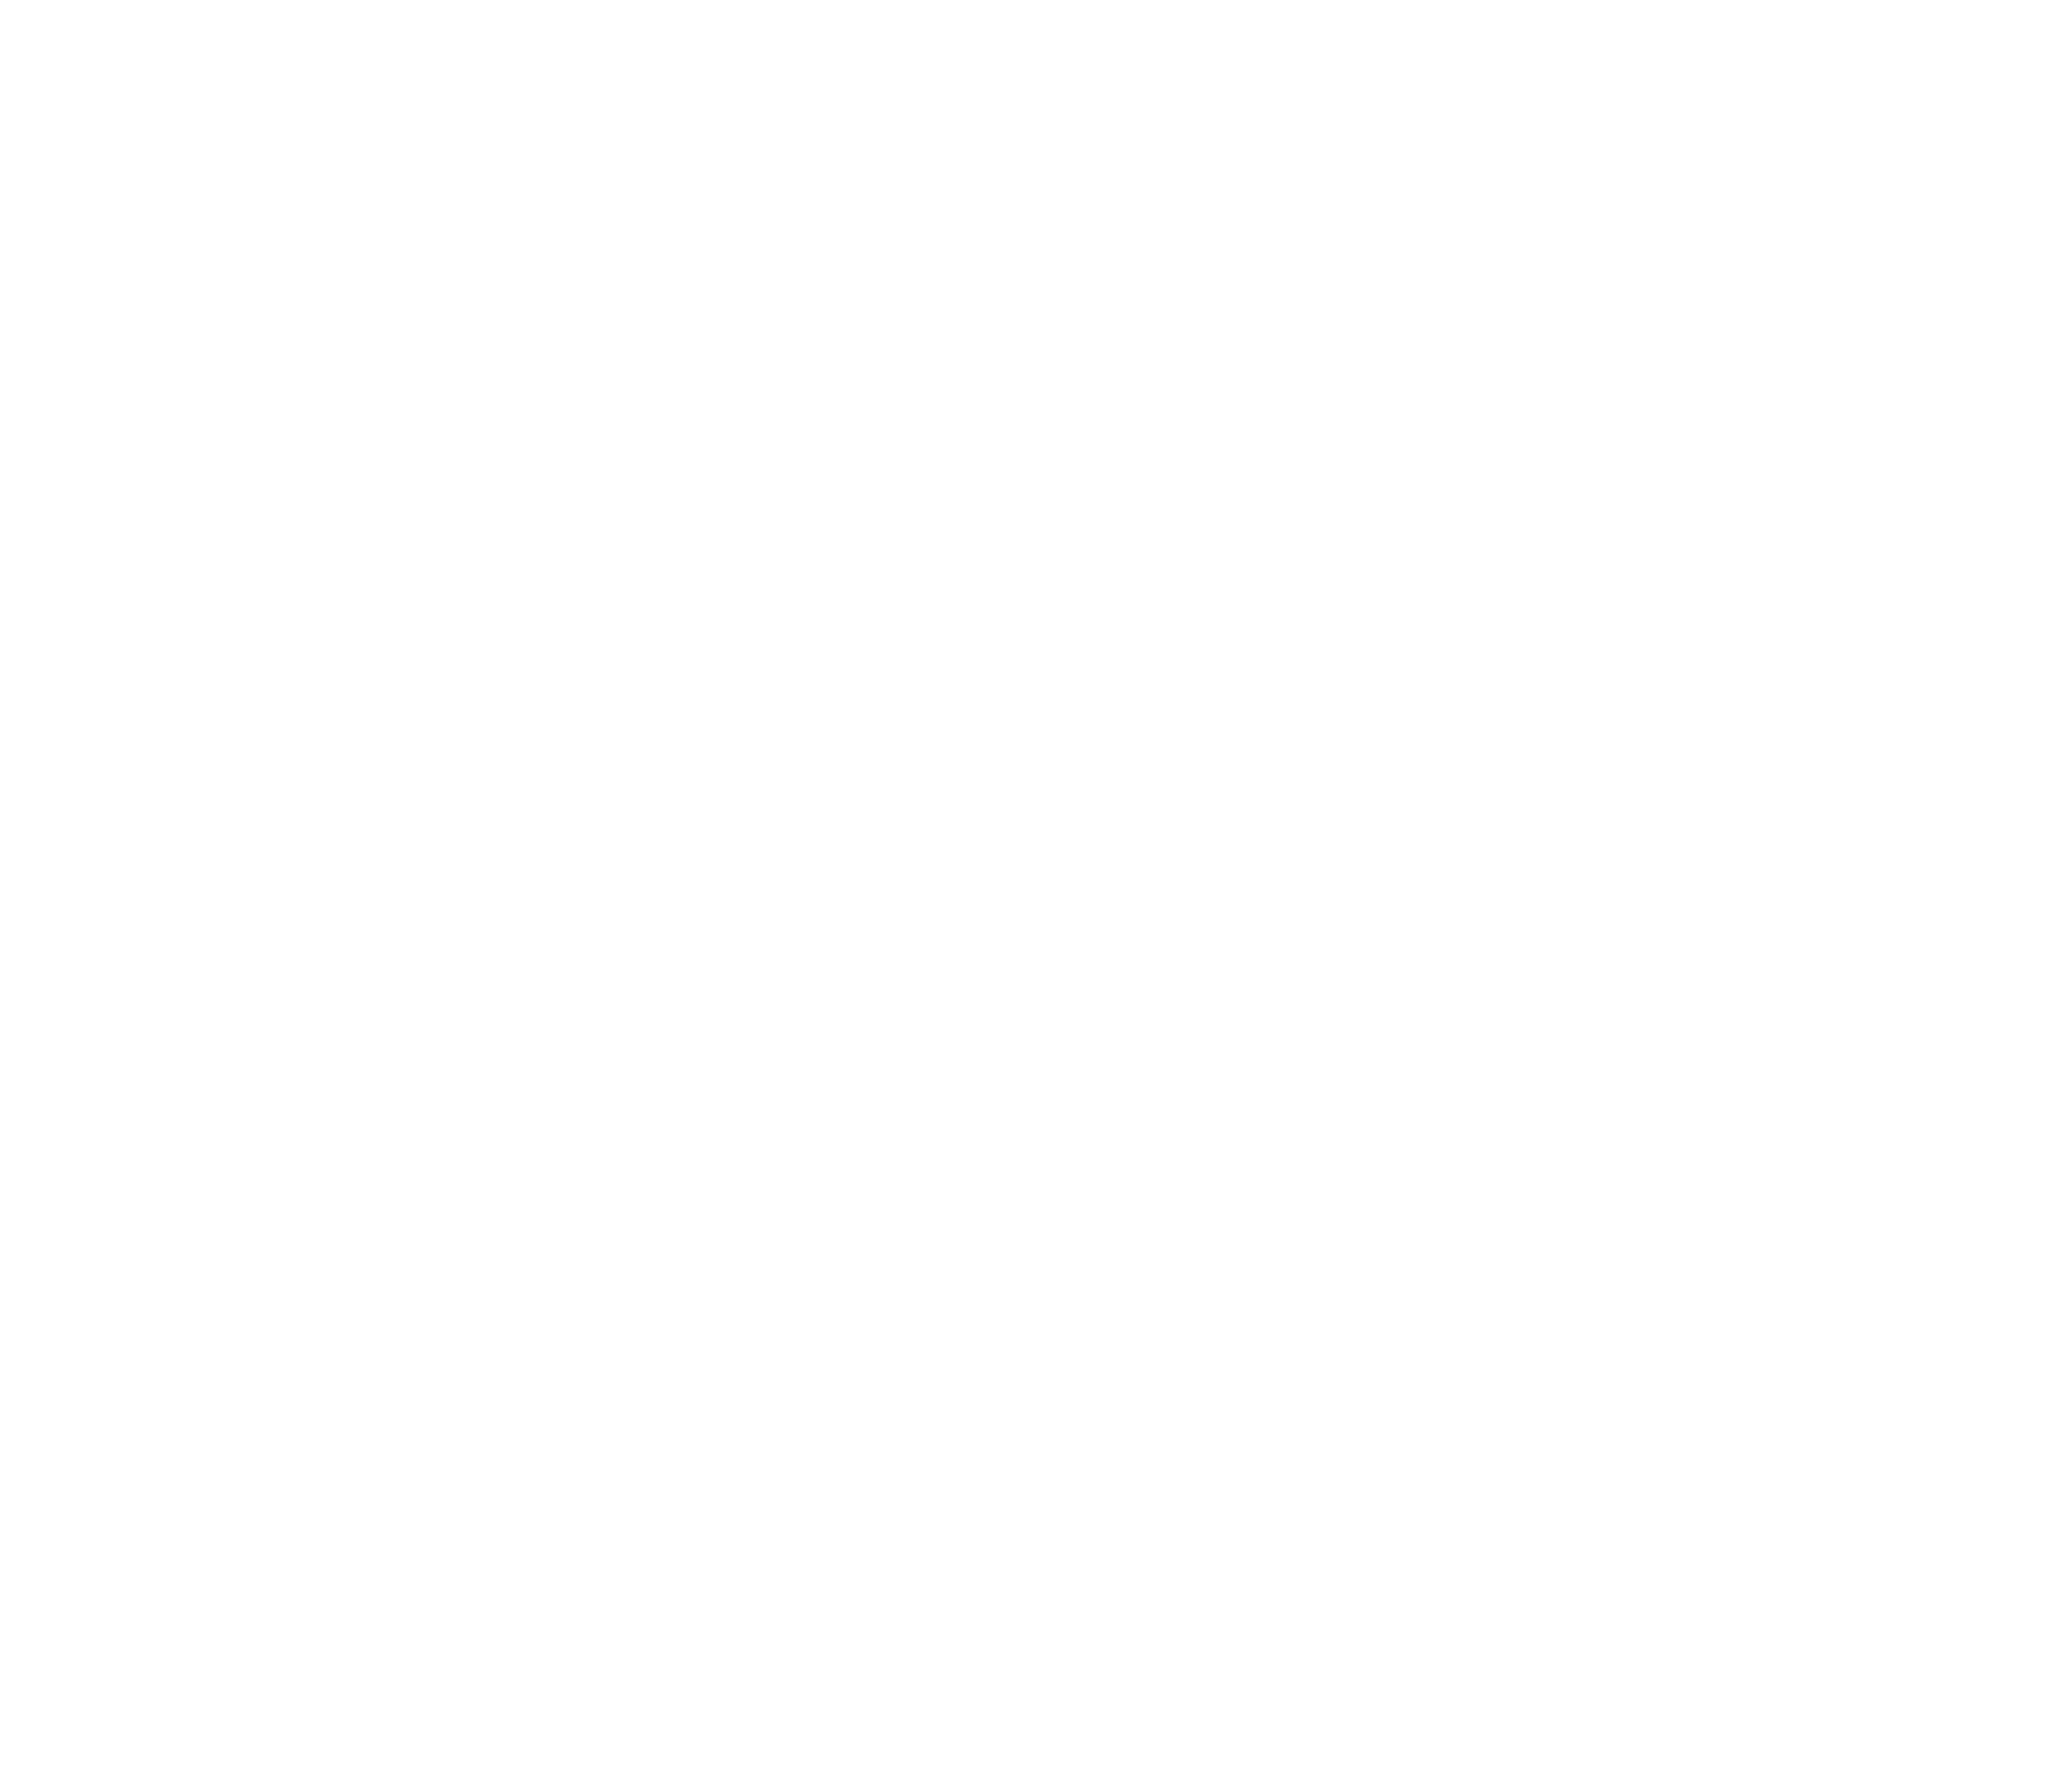 Hanger Talk